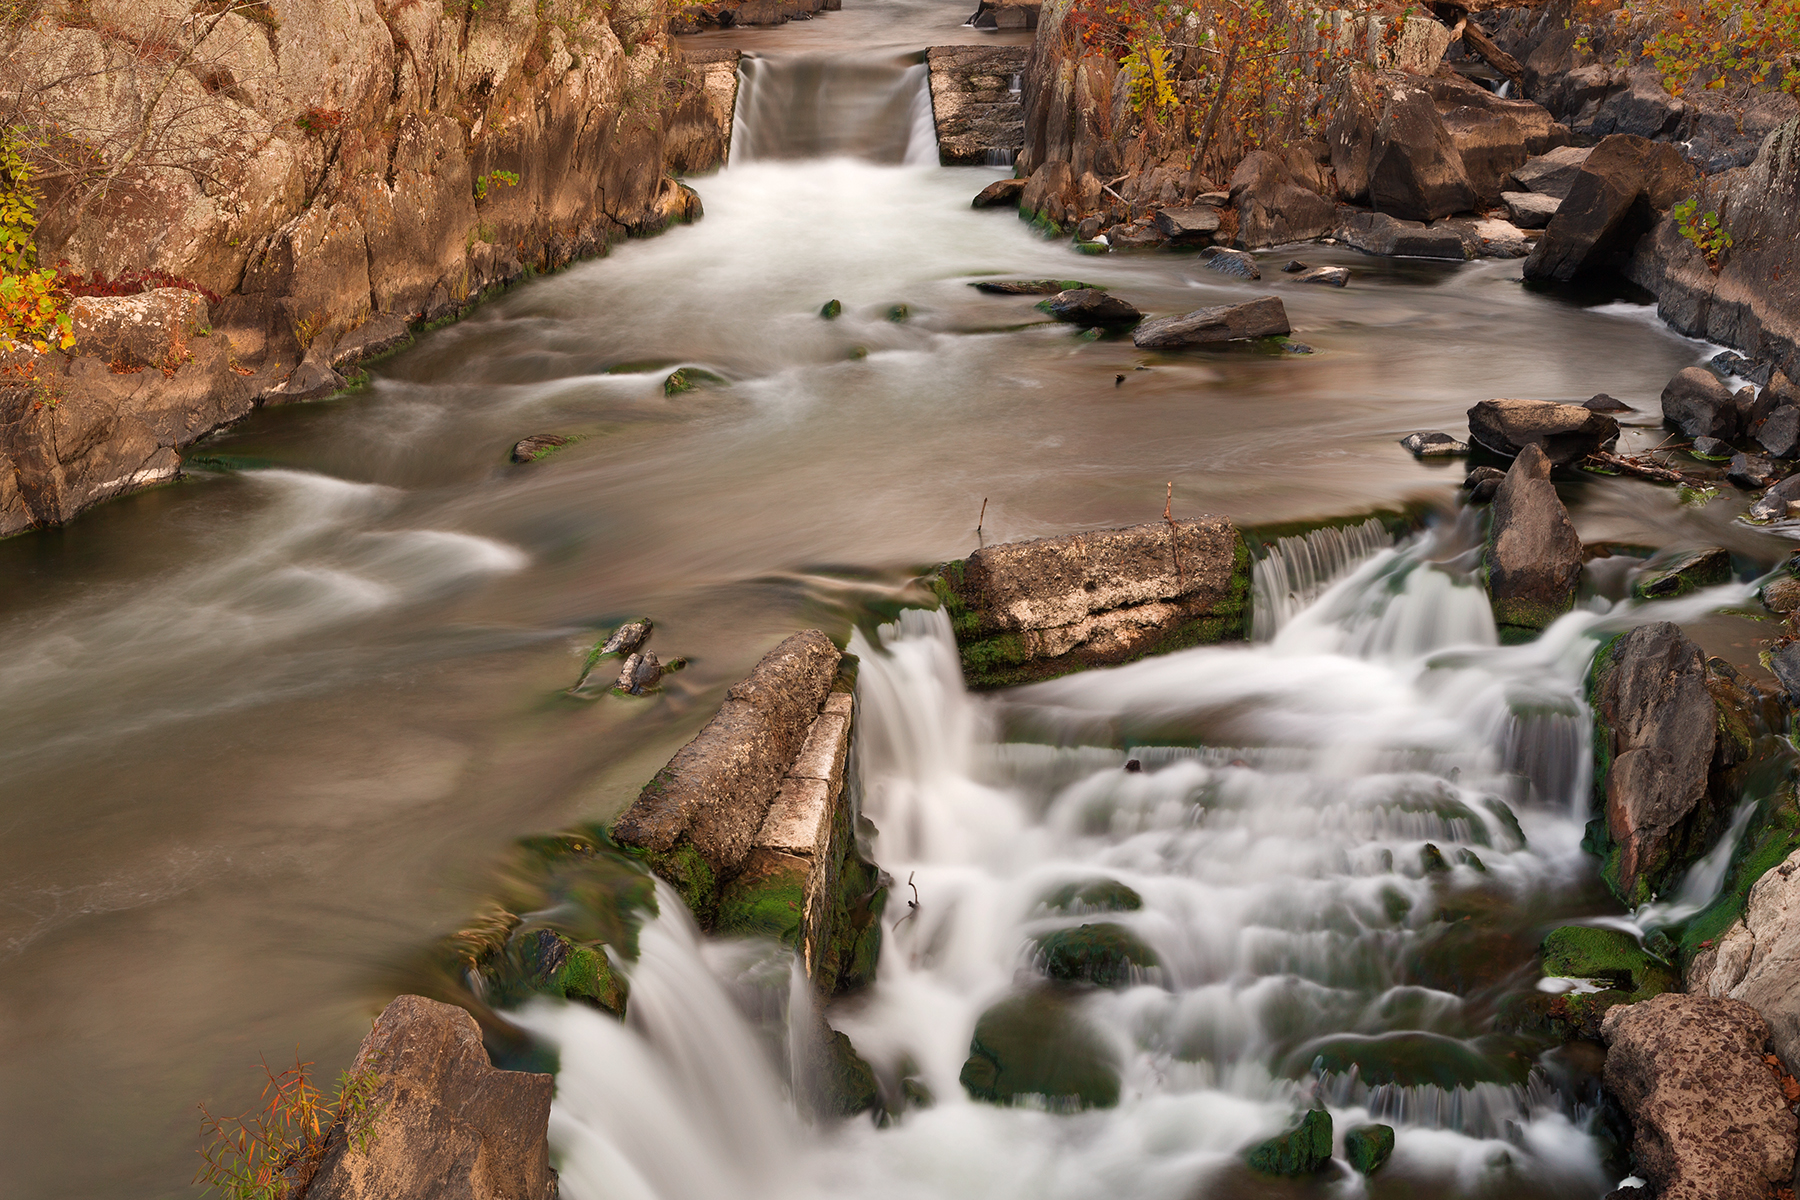 Great Sinkhole Falls, America, Perspective, Scene, Rugged, HQ Photo